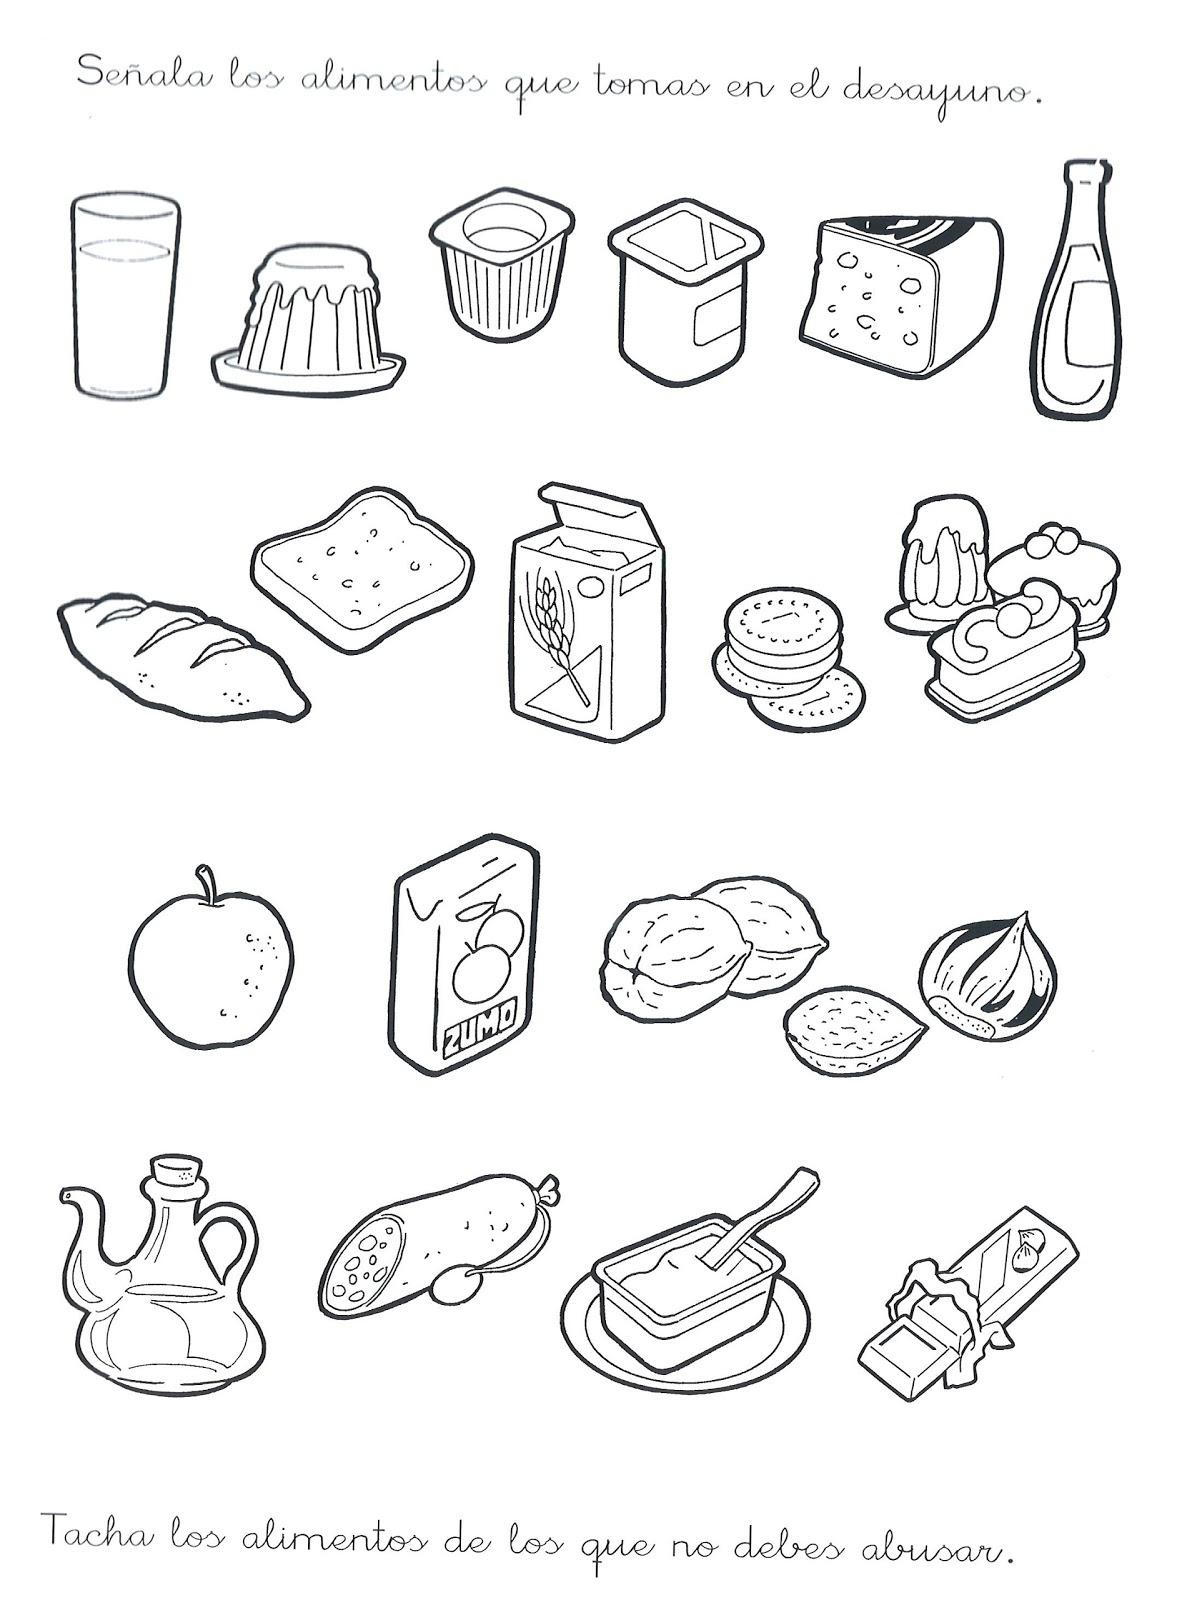 Imagenes De Almuerzos Nutritivos Escolares Para Nios